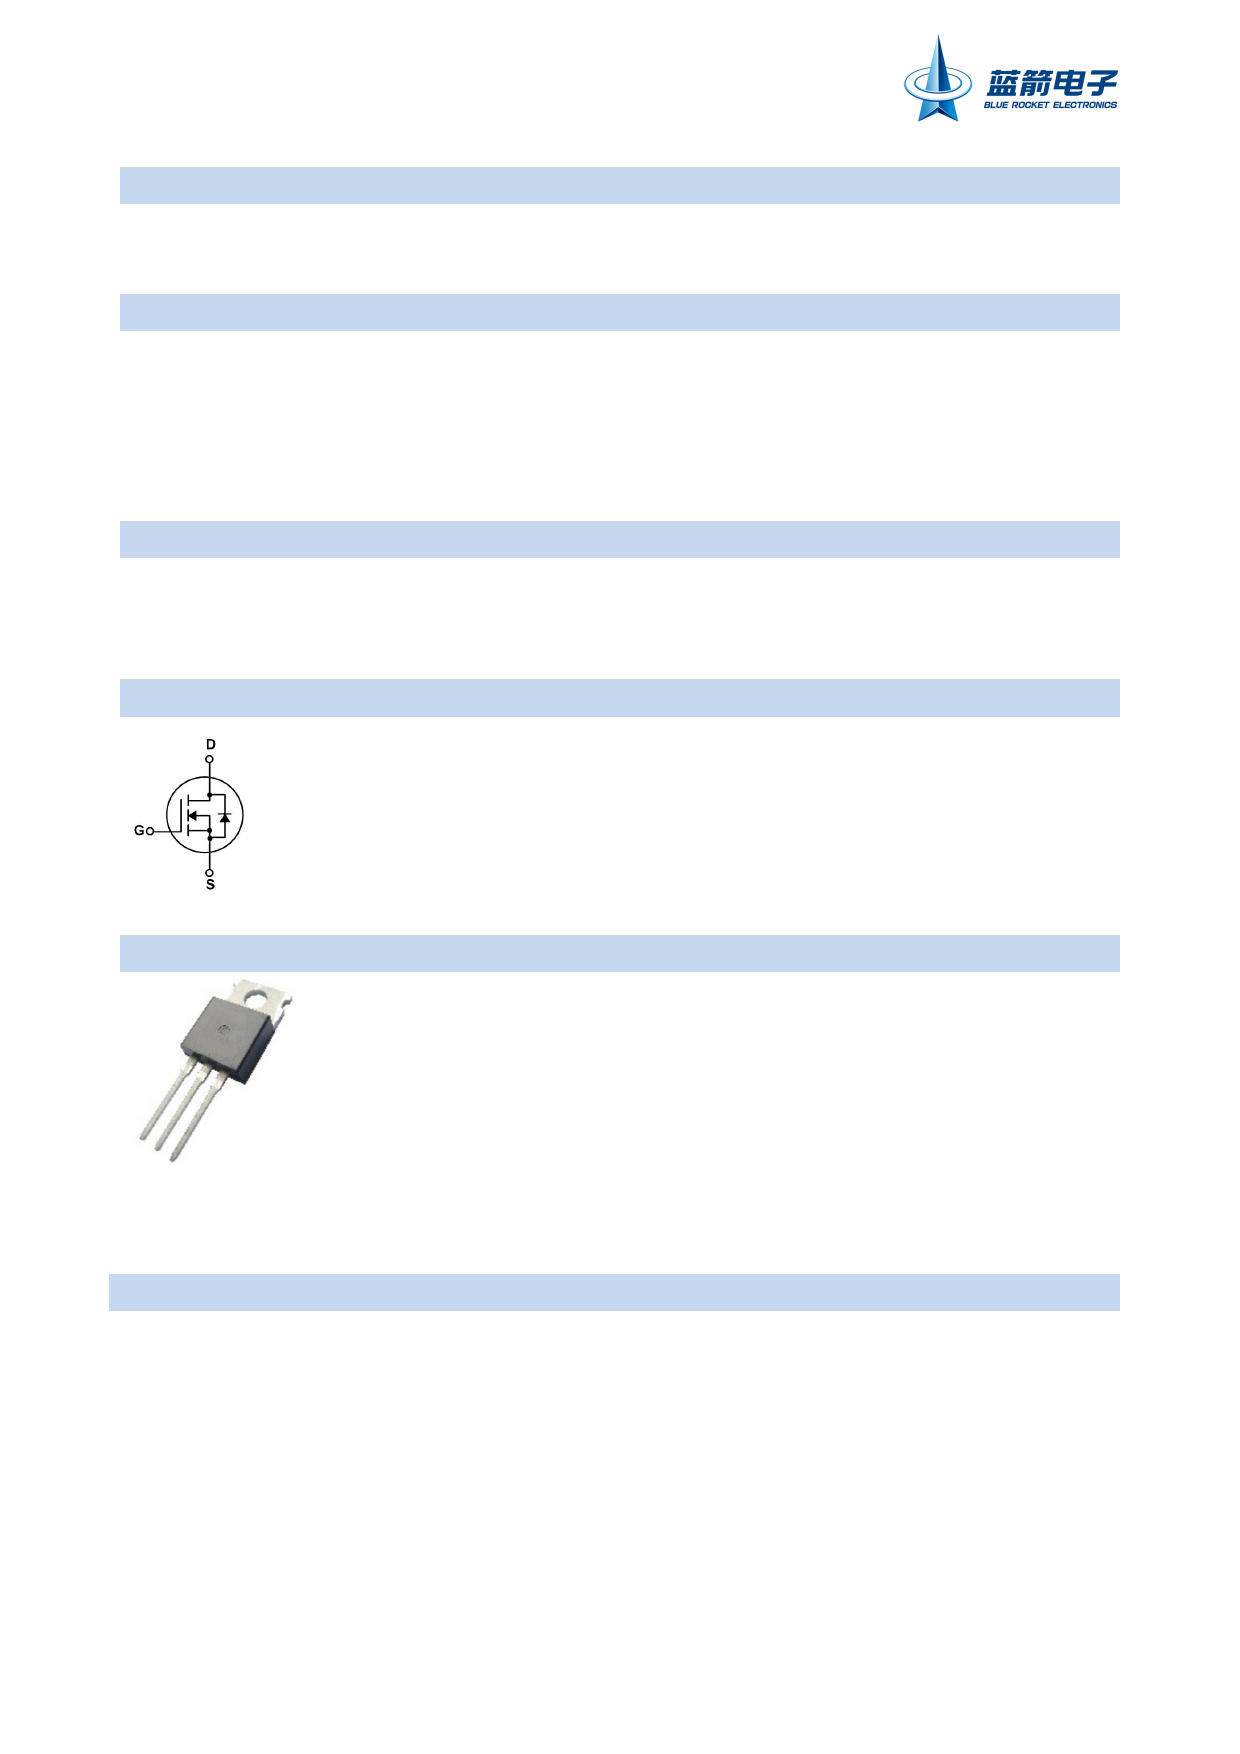 IRFZ44 Datasheet, IRFZ44 PDF,ピン配置, 機能